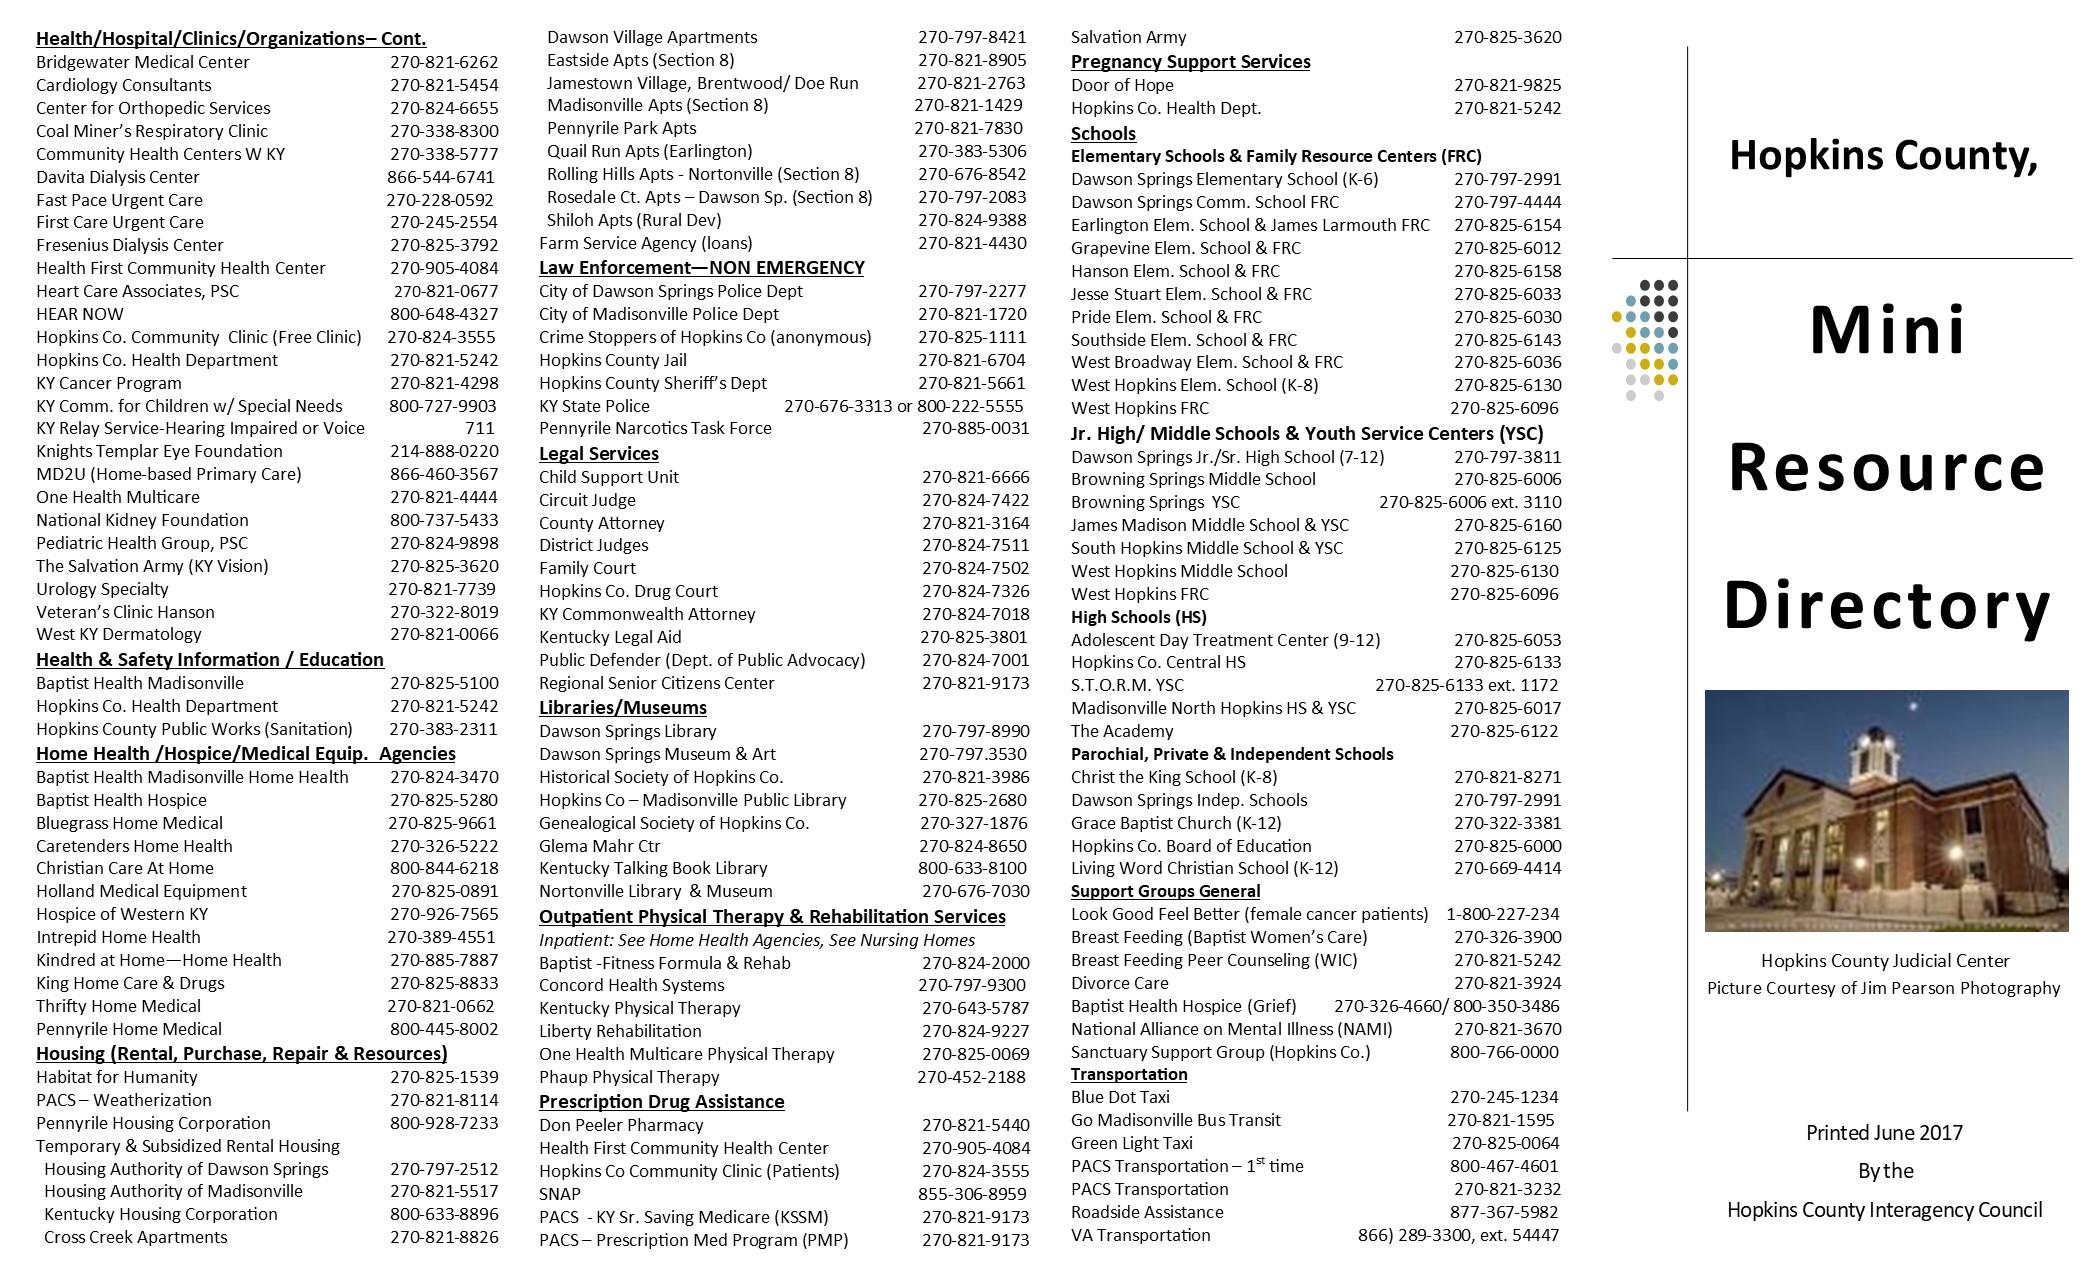 Hopkins County Resource Directory